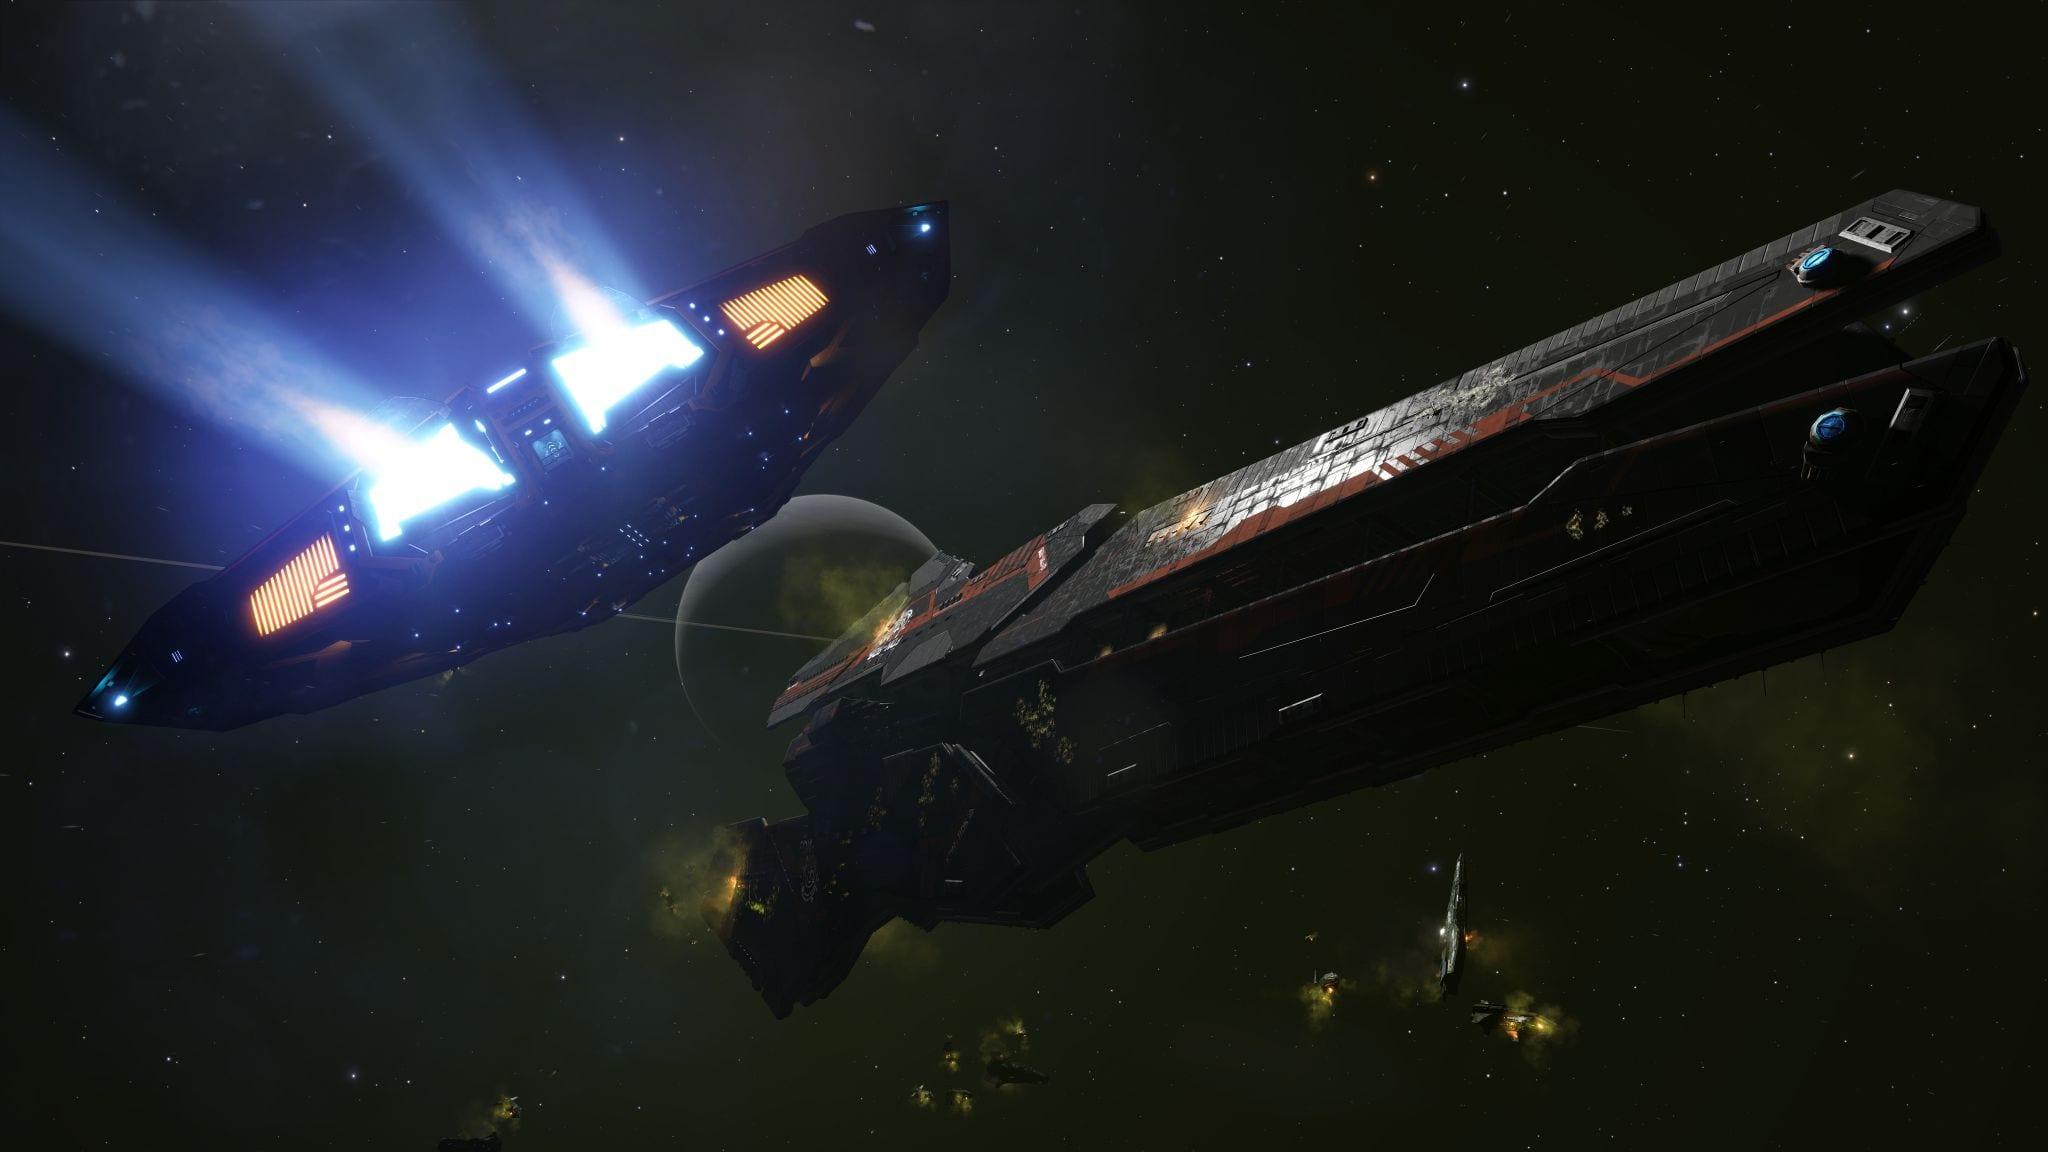 Elite Dangerous: The Return 2.4 Beta begins 17 August